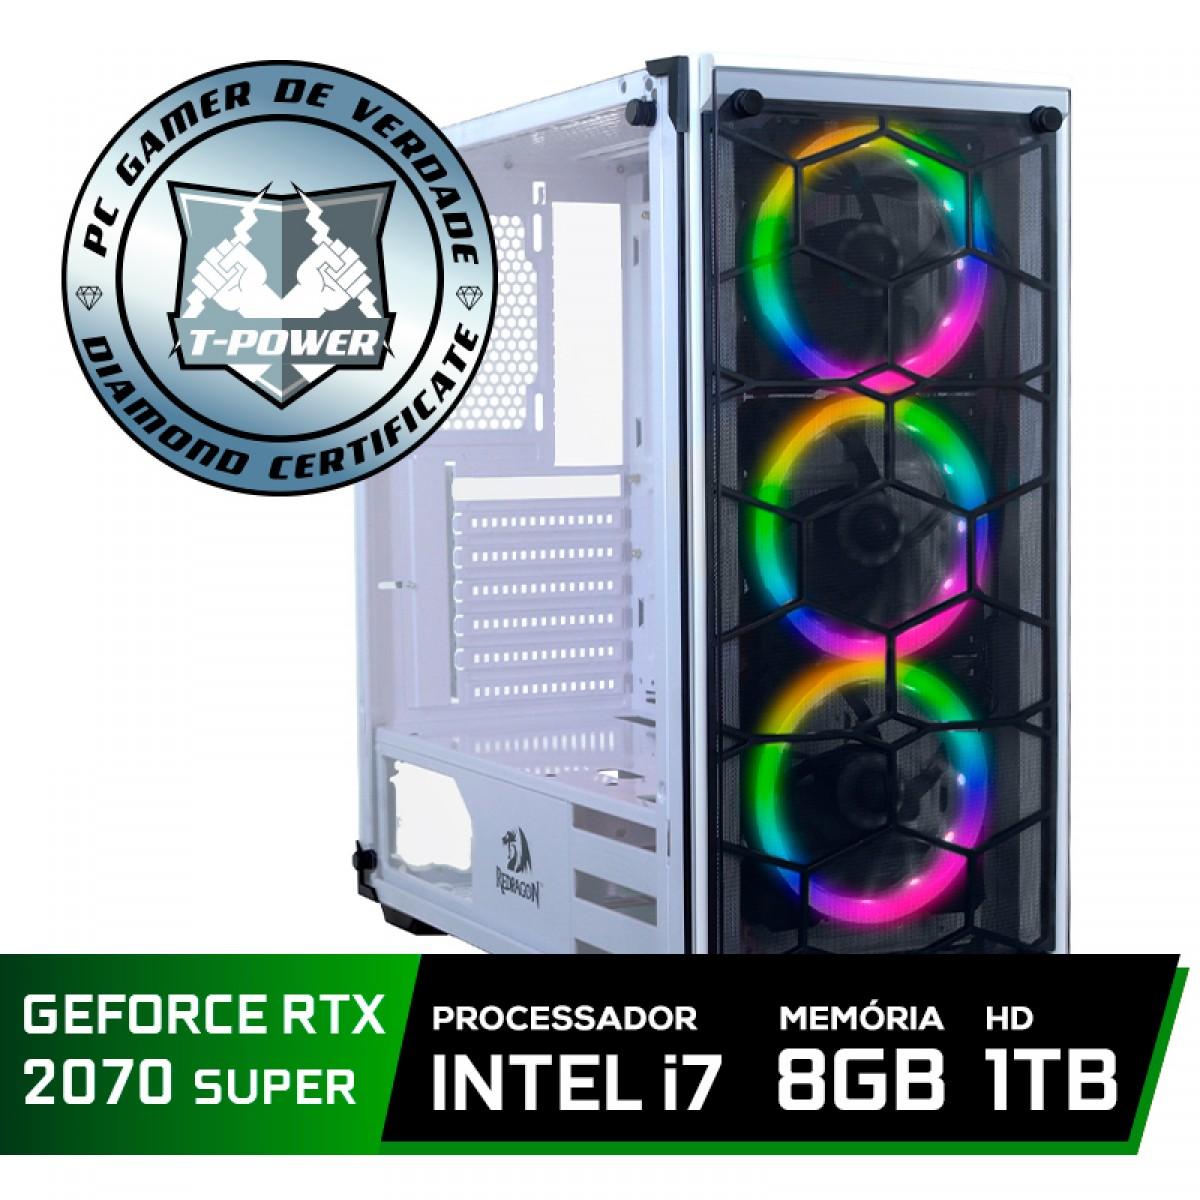 Pc Gamer Tera Edition Intel i7 9700F / Geforce RTX 2070 Super / DDR4 8GB / HD 1TB / 600W